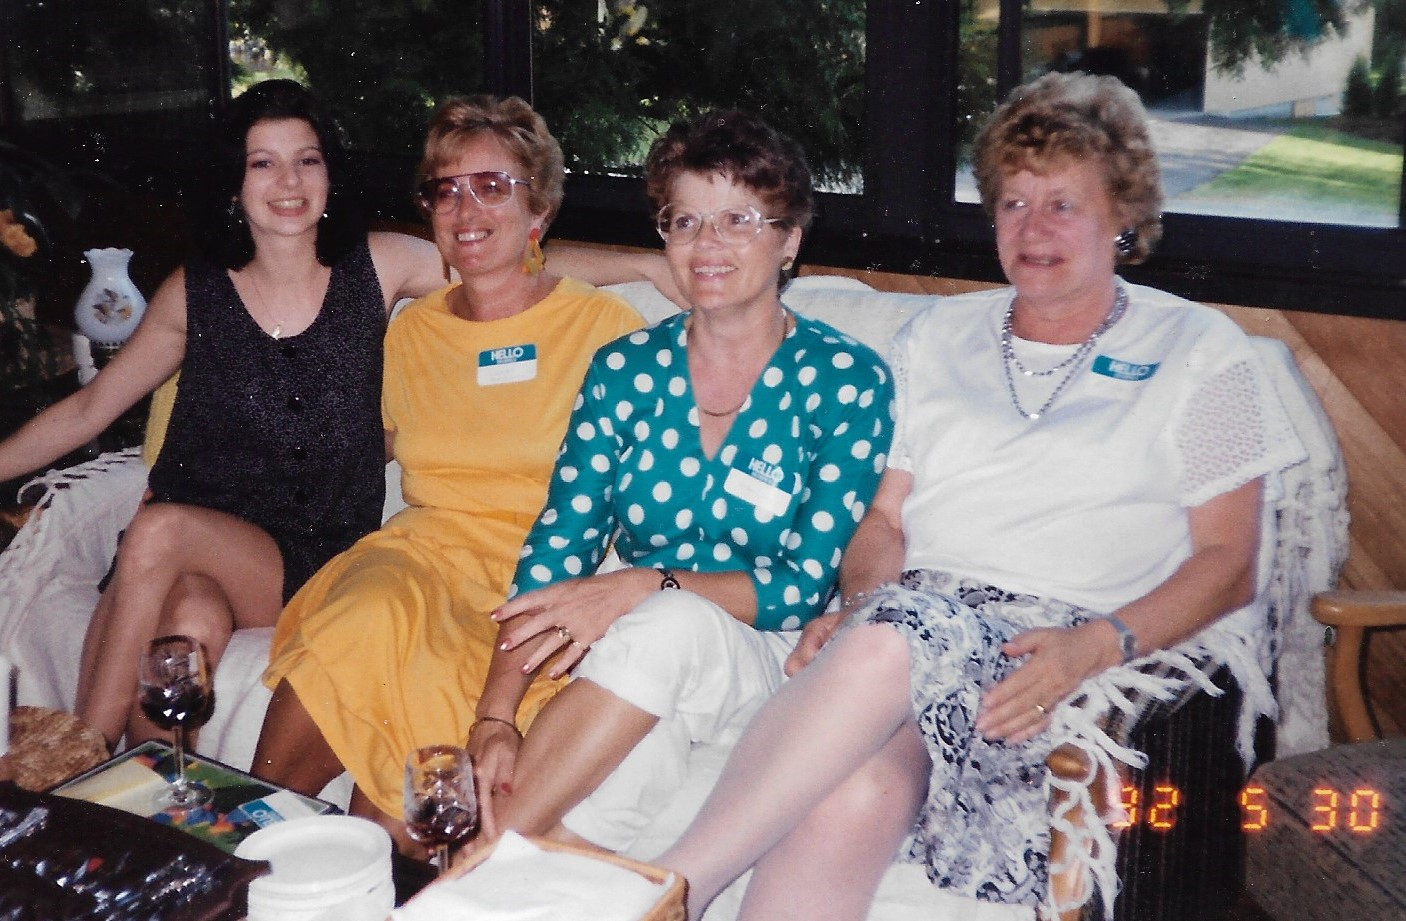 Anne in polka dots with Rita Heida (right)